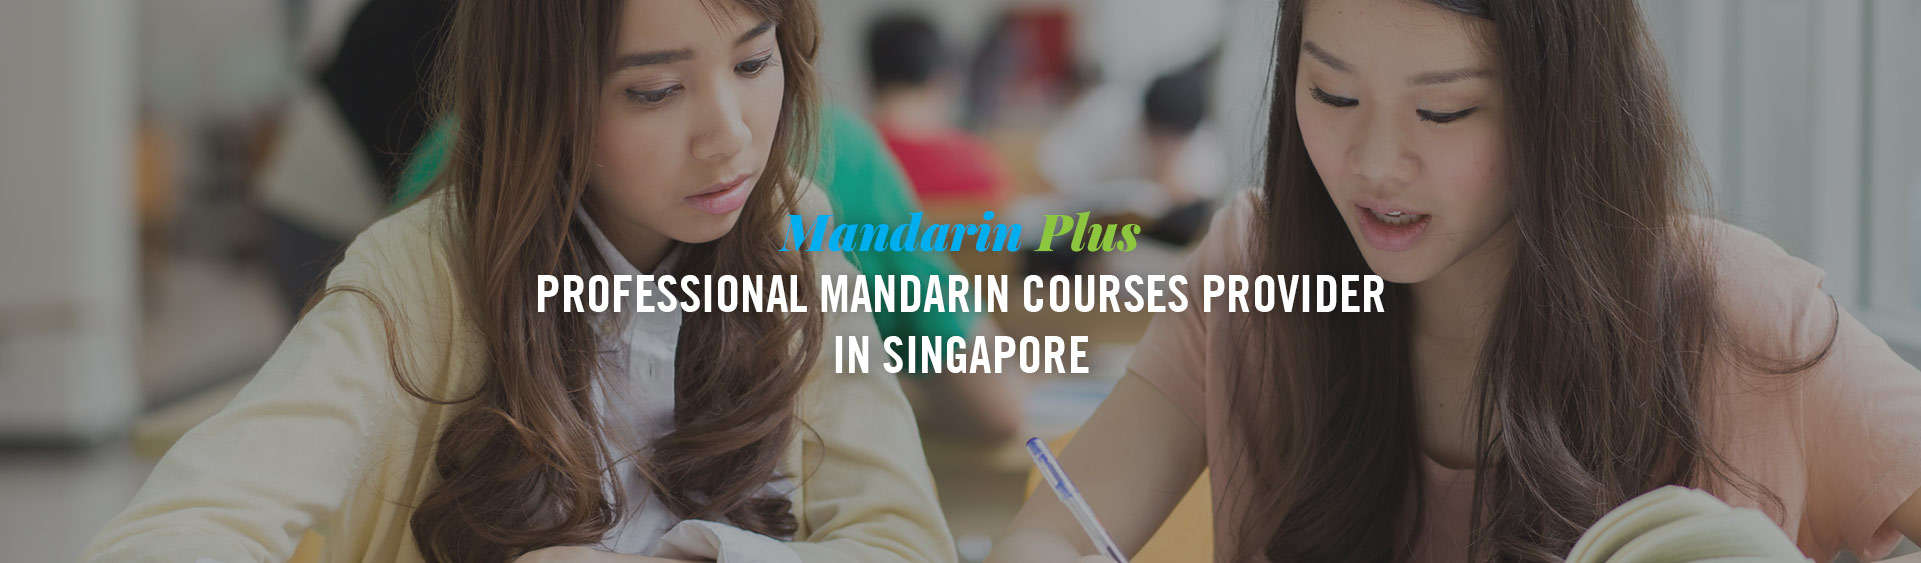 professional mandarin courses provider in singapore